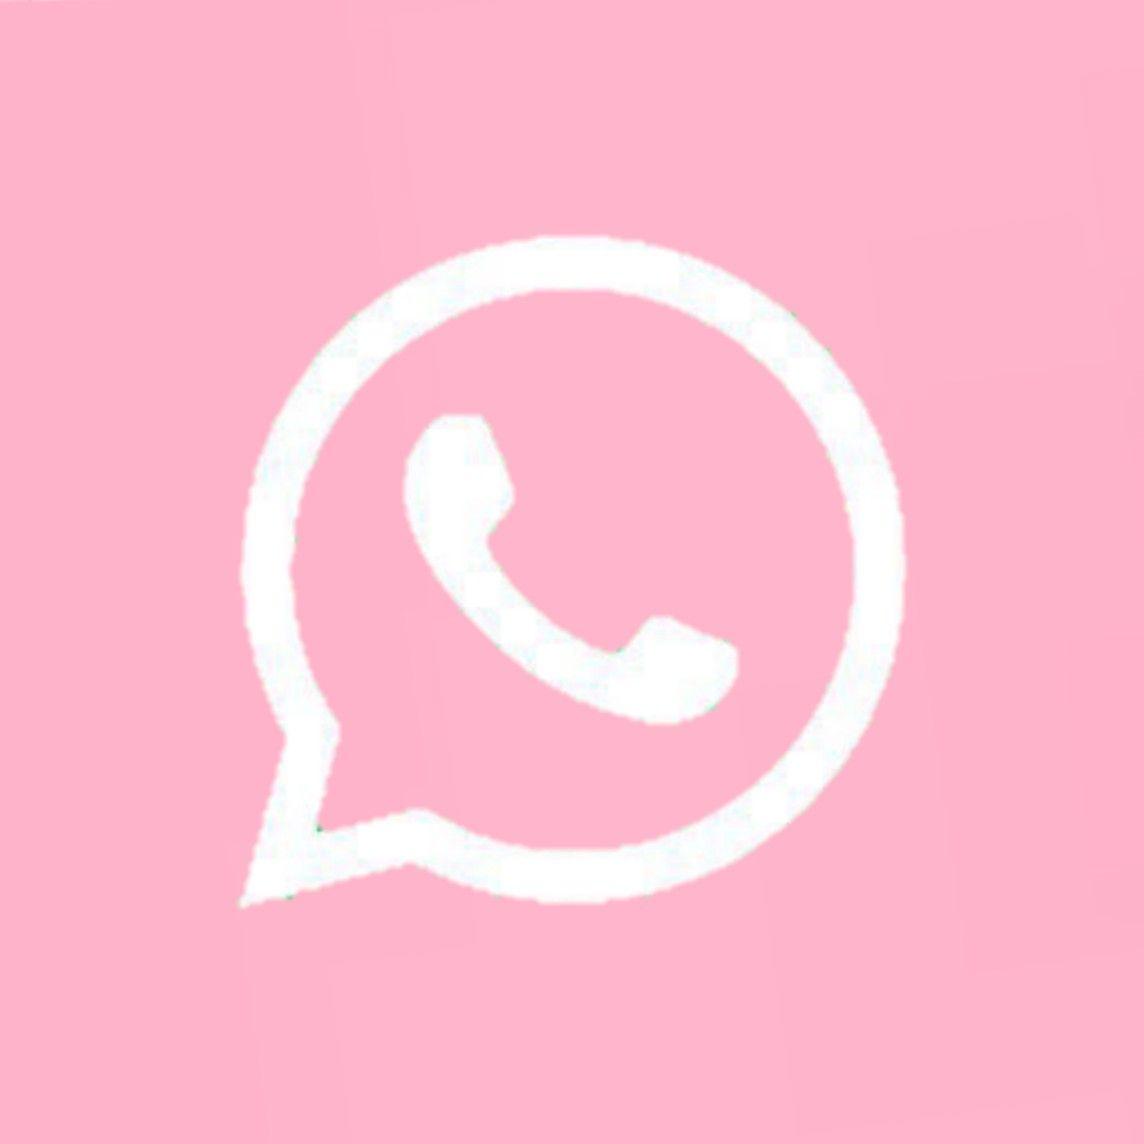 Whatsapp Pink In 2020 Iphone App Design Iphone Homescreen Wallpaper Wallpaper App